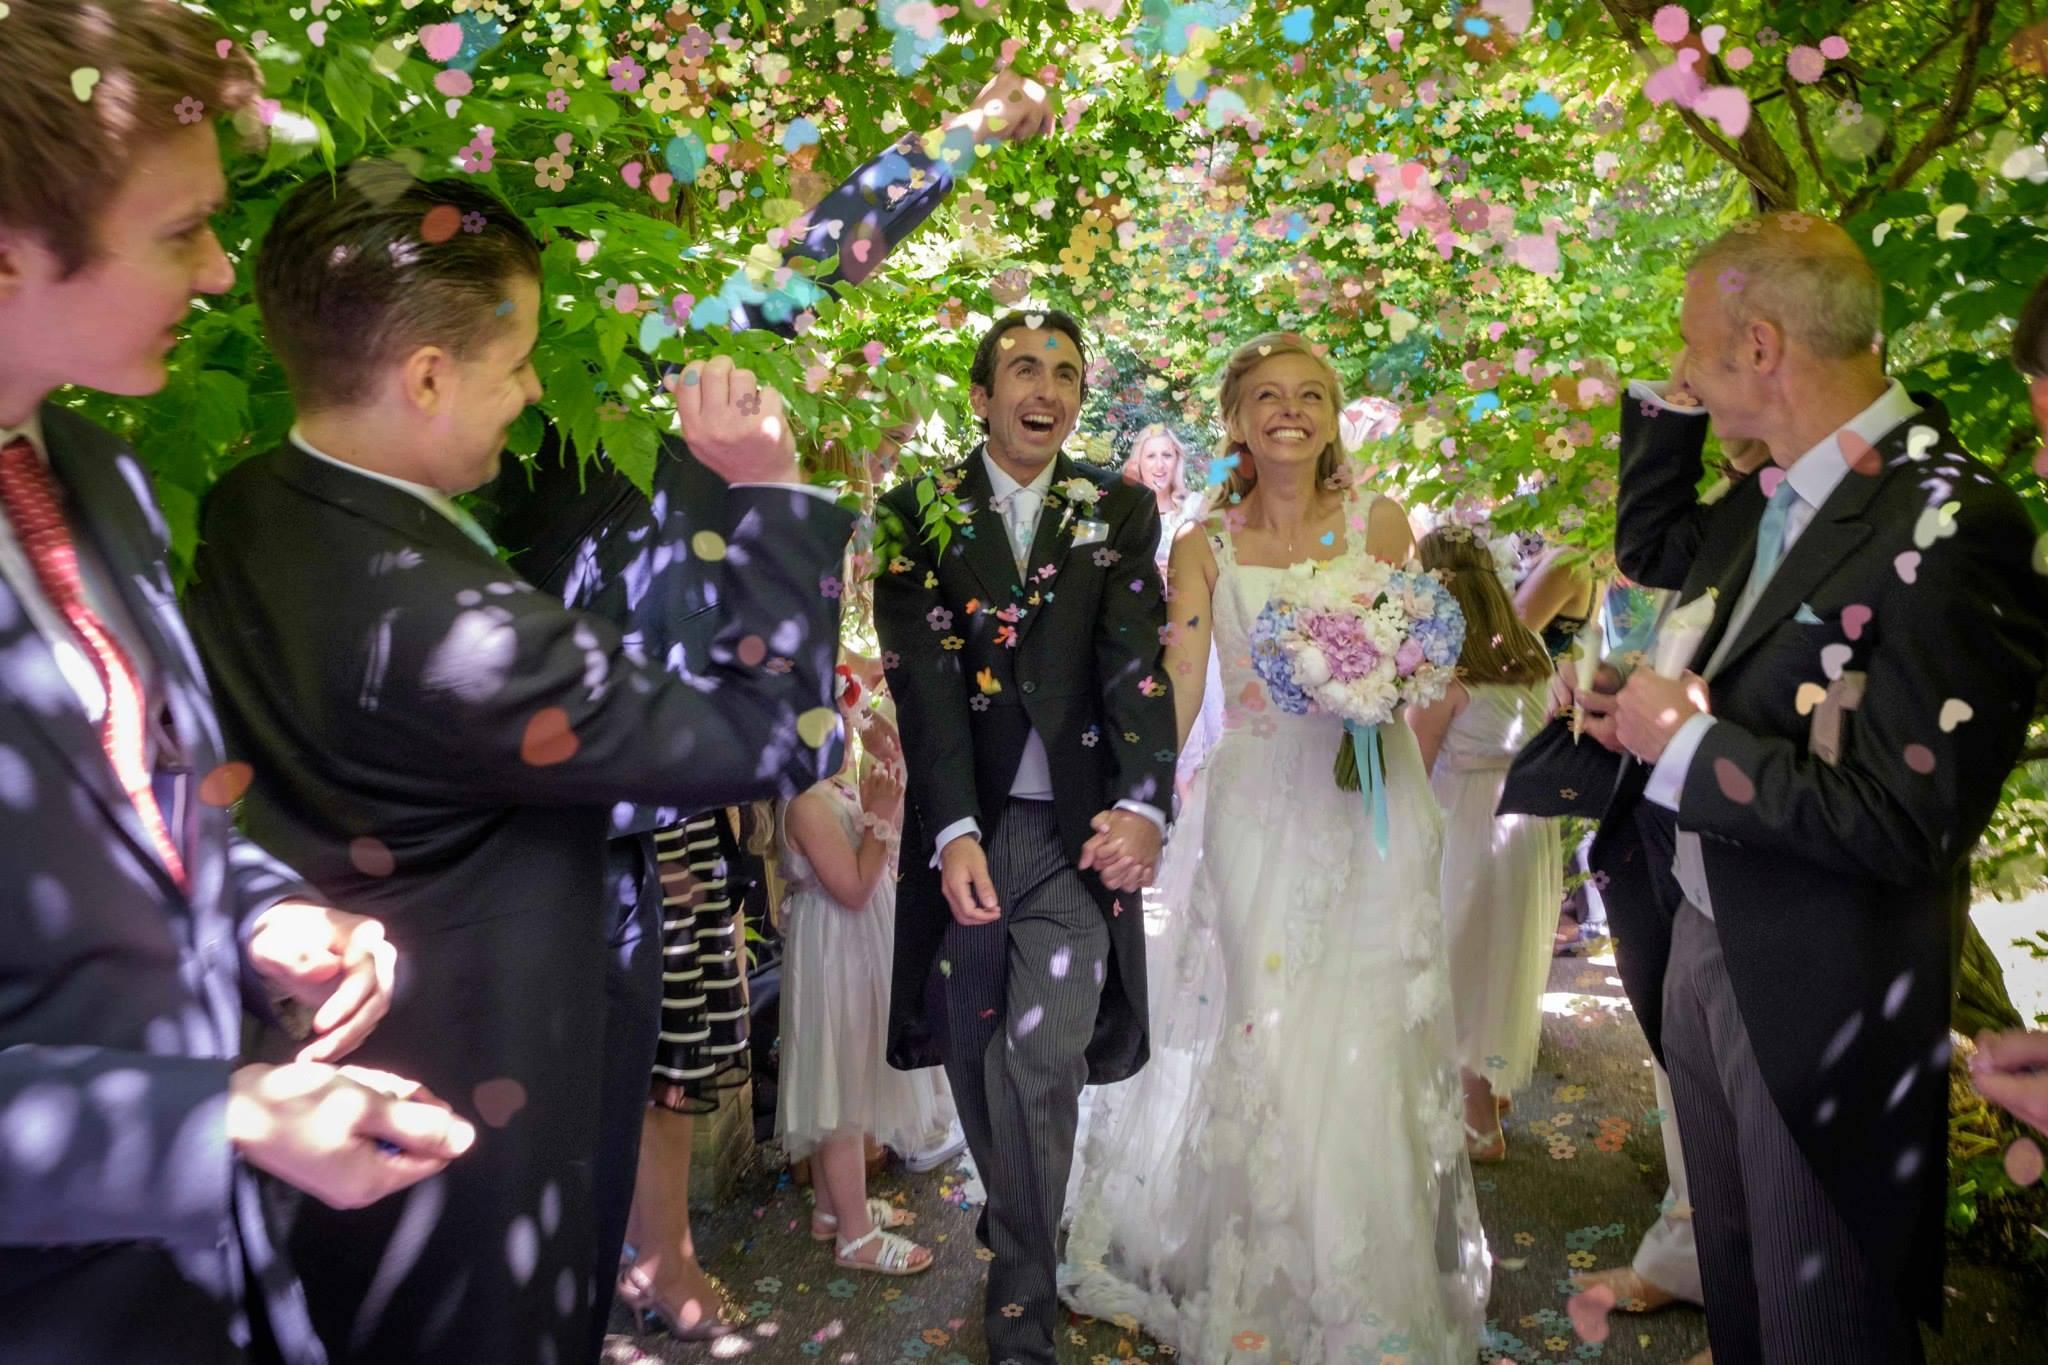 Wedding Ventnor Botanic Gardens, Isle of Wight Wedding, Petit Tor self-catering accommodation